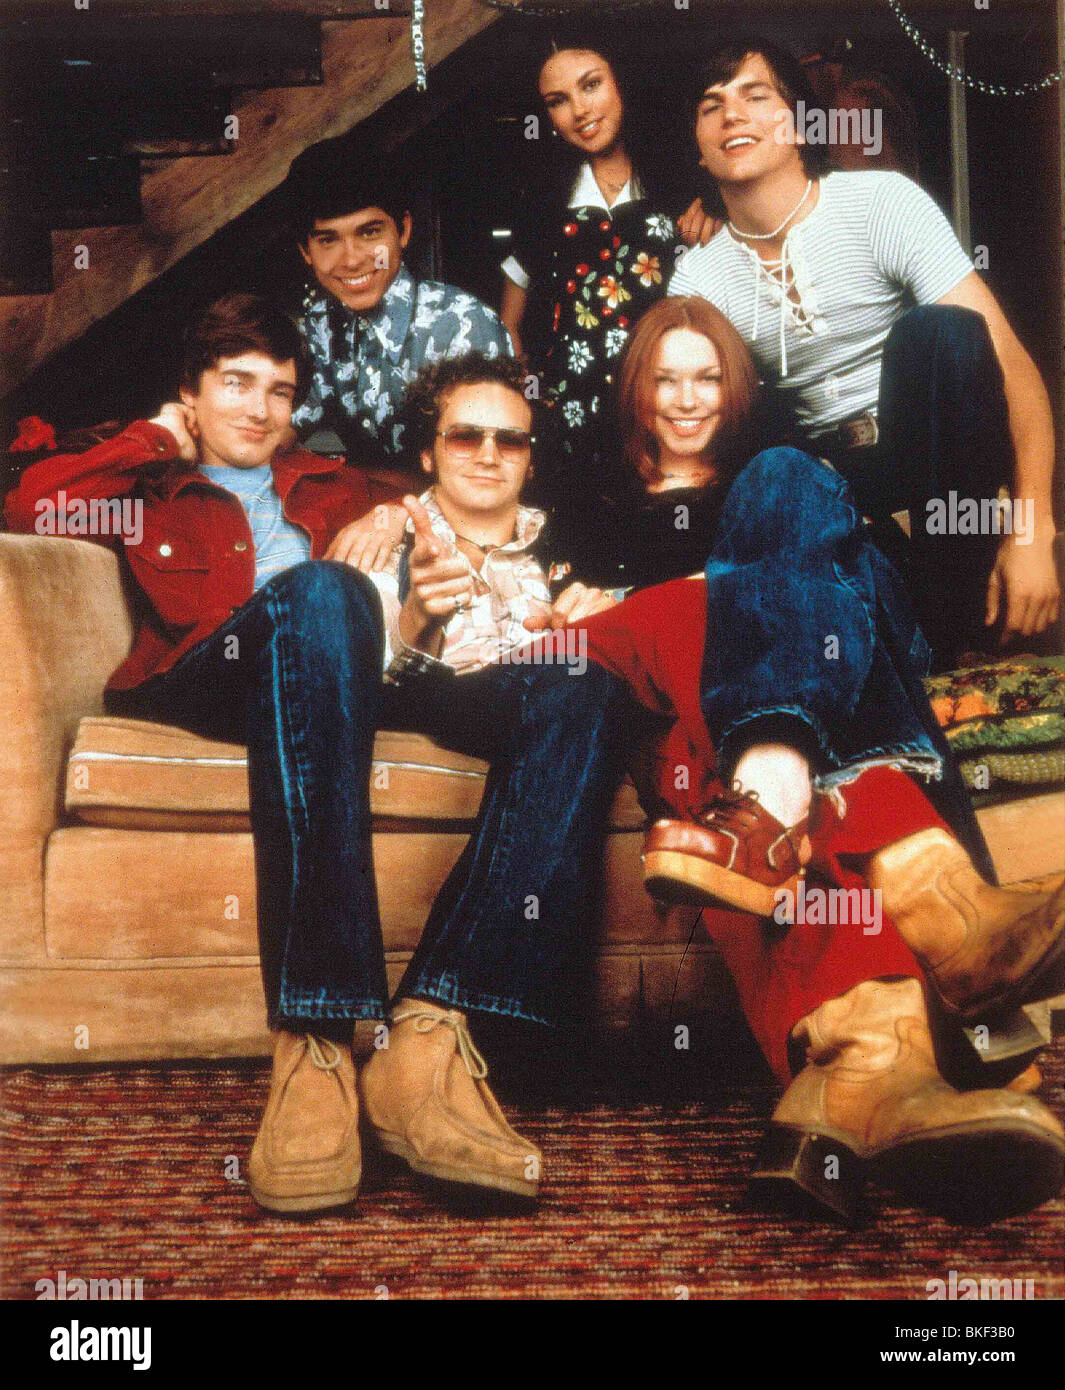 THAT 70'S SHOW (TV - 1998) TOPHER GRACE, WILMER VALDERAMA, DANNY MASTERSON, MILA KUNIS, LAURA PREPON, ASHTON - Stock Image